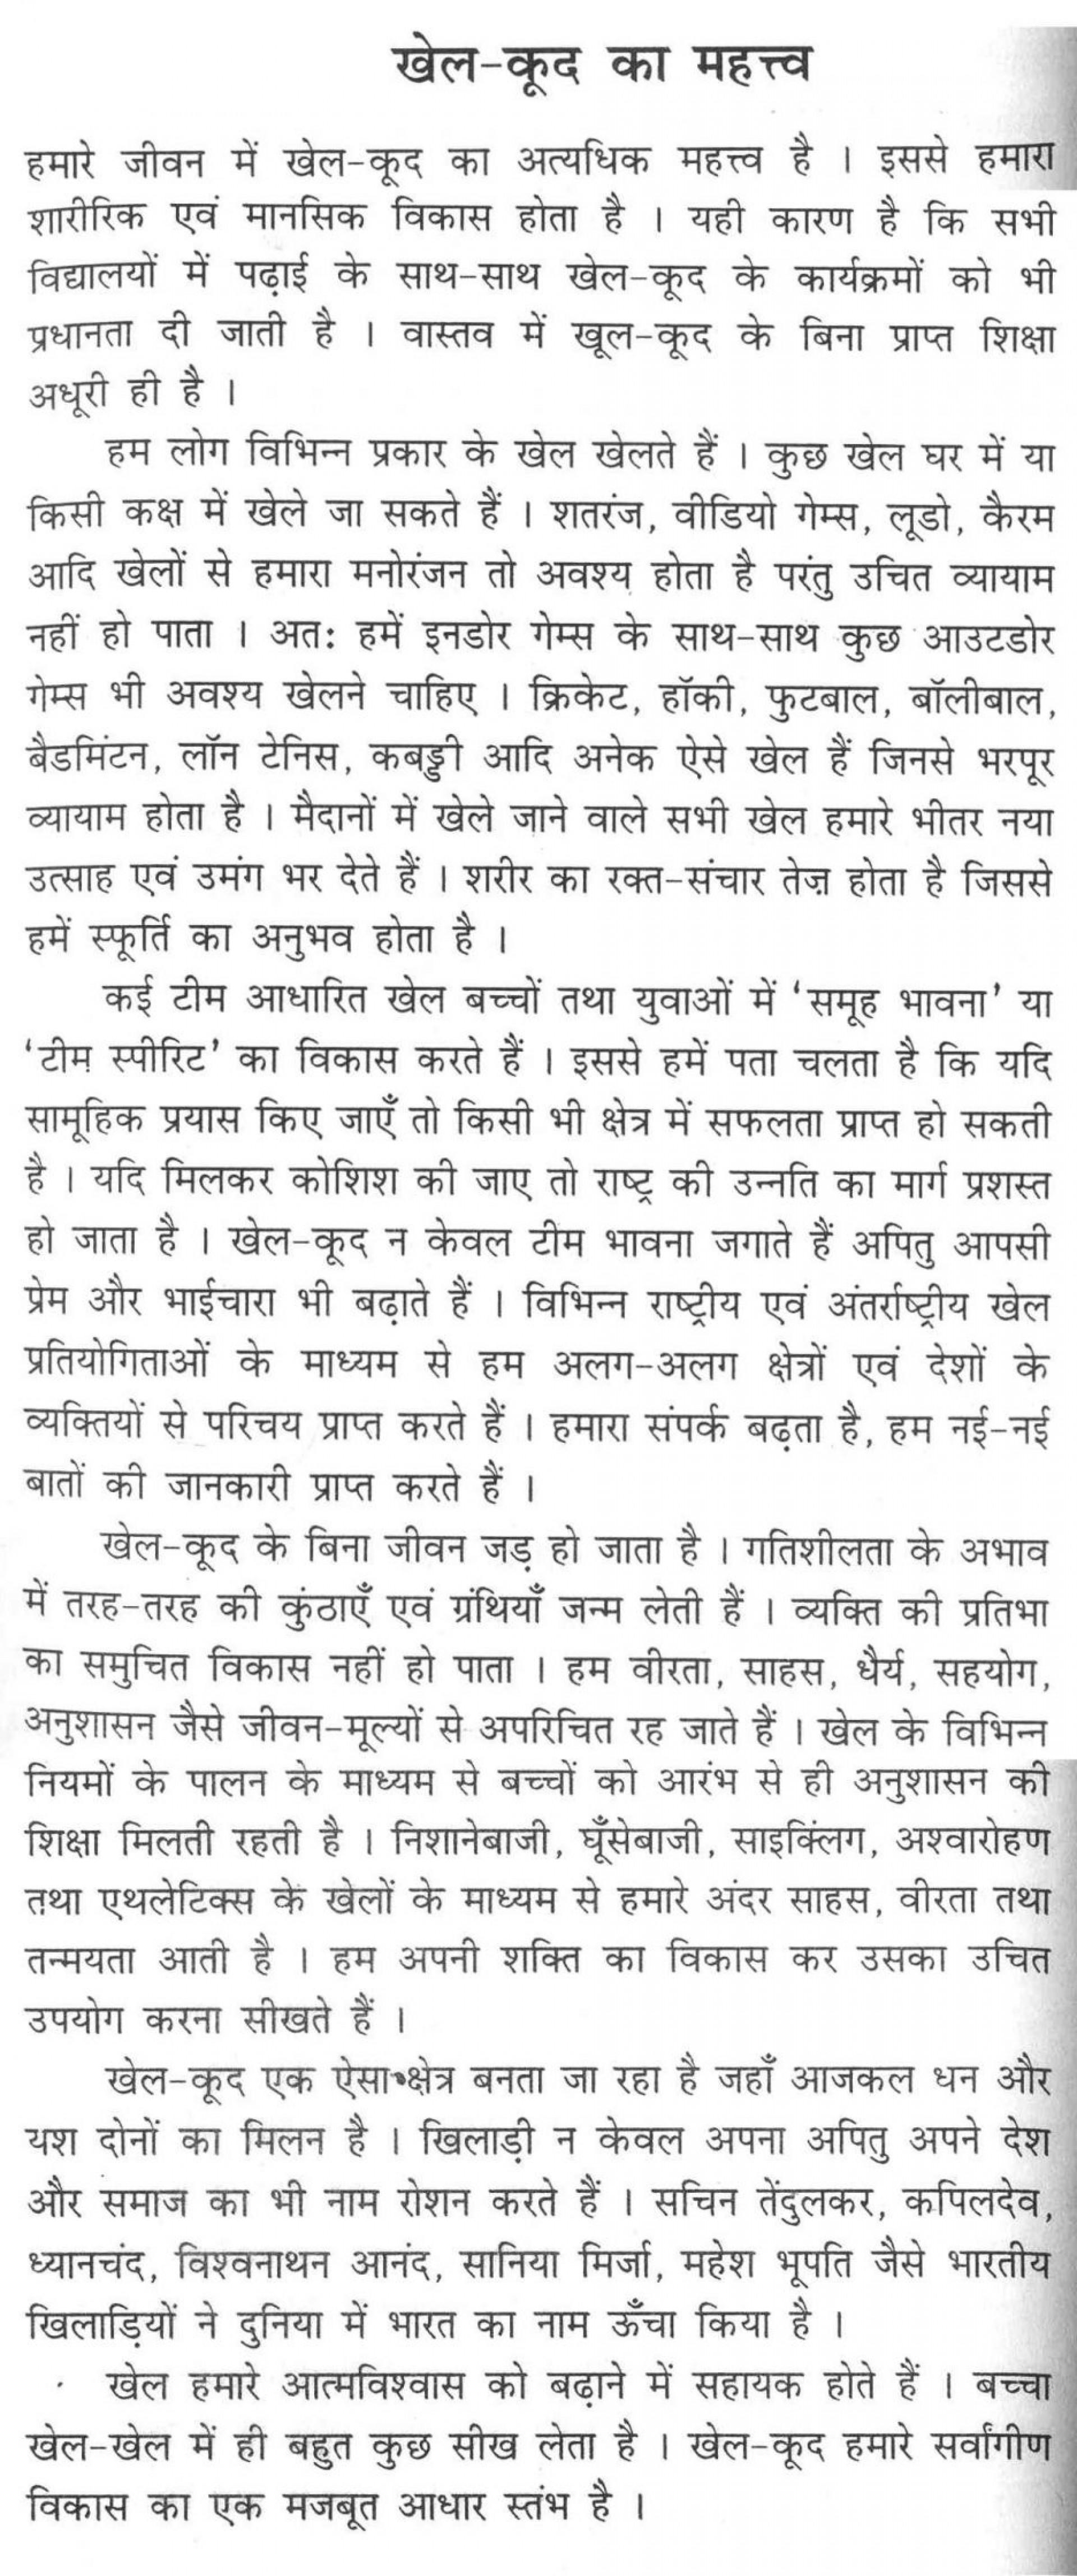 025 Importance Of Voting Essay Essays Hindi Thumb Pdf In Kannada The Tamil Persuasive English India On Punjabi Rights 936x2239 Unforgettable Marathi 1920